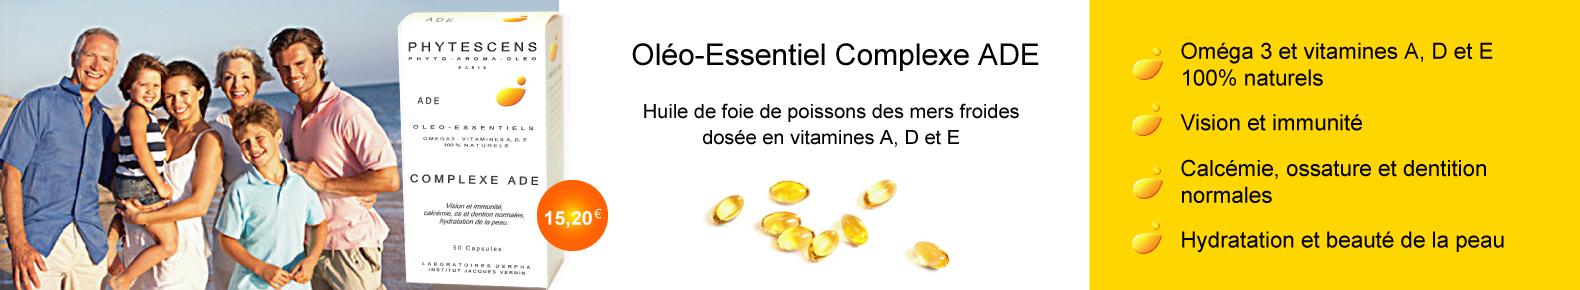 Huile de foie de morue garantie en vitamines a d et e